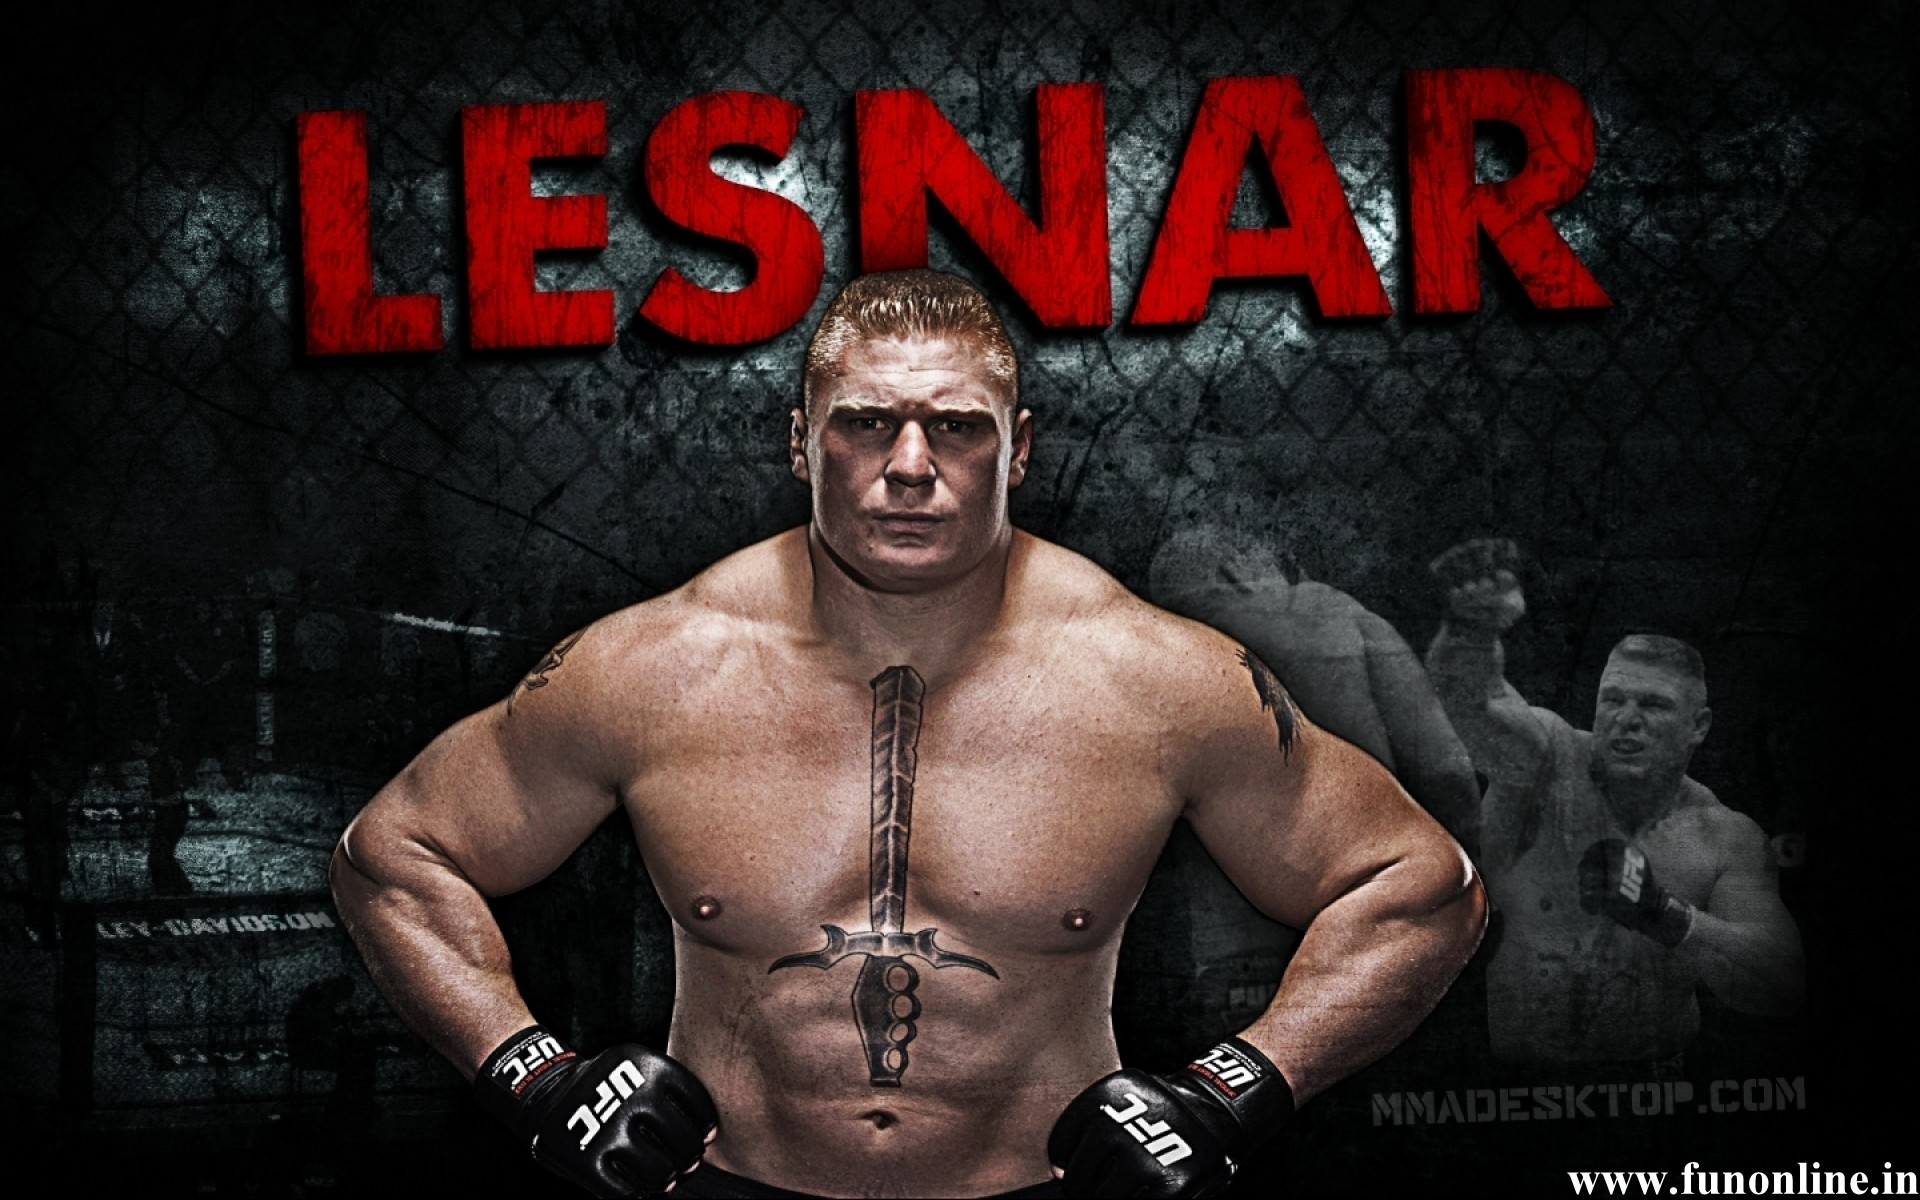 Brock Lesnar Wallpaper Hd 77 Images